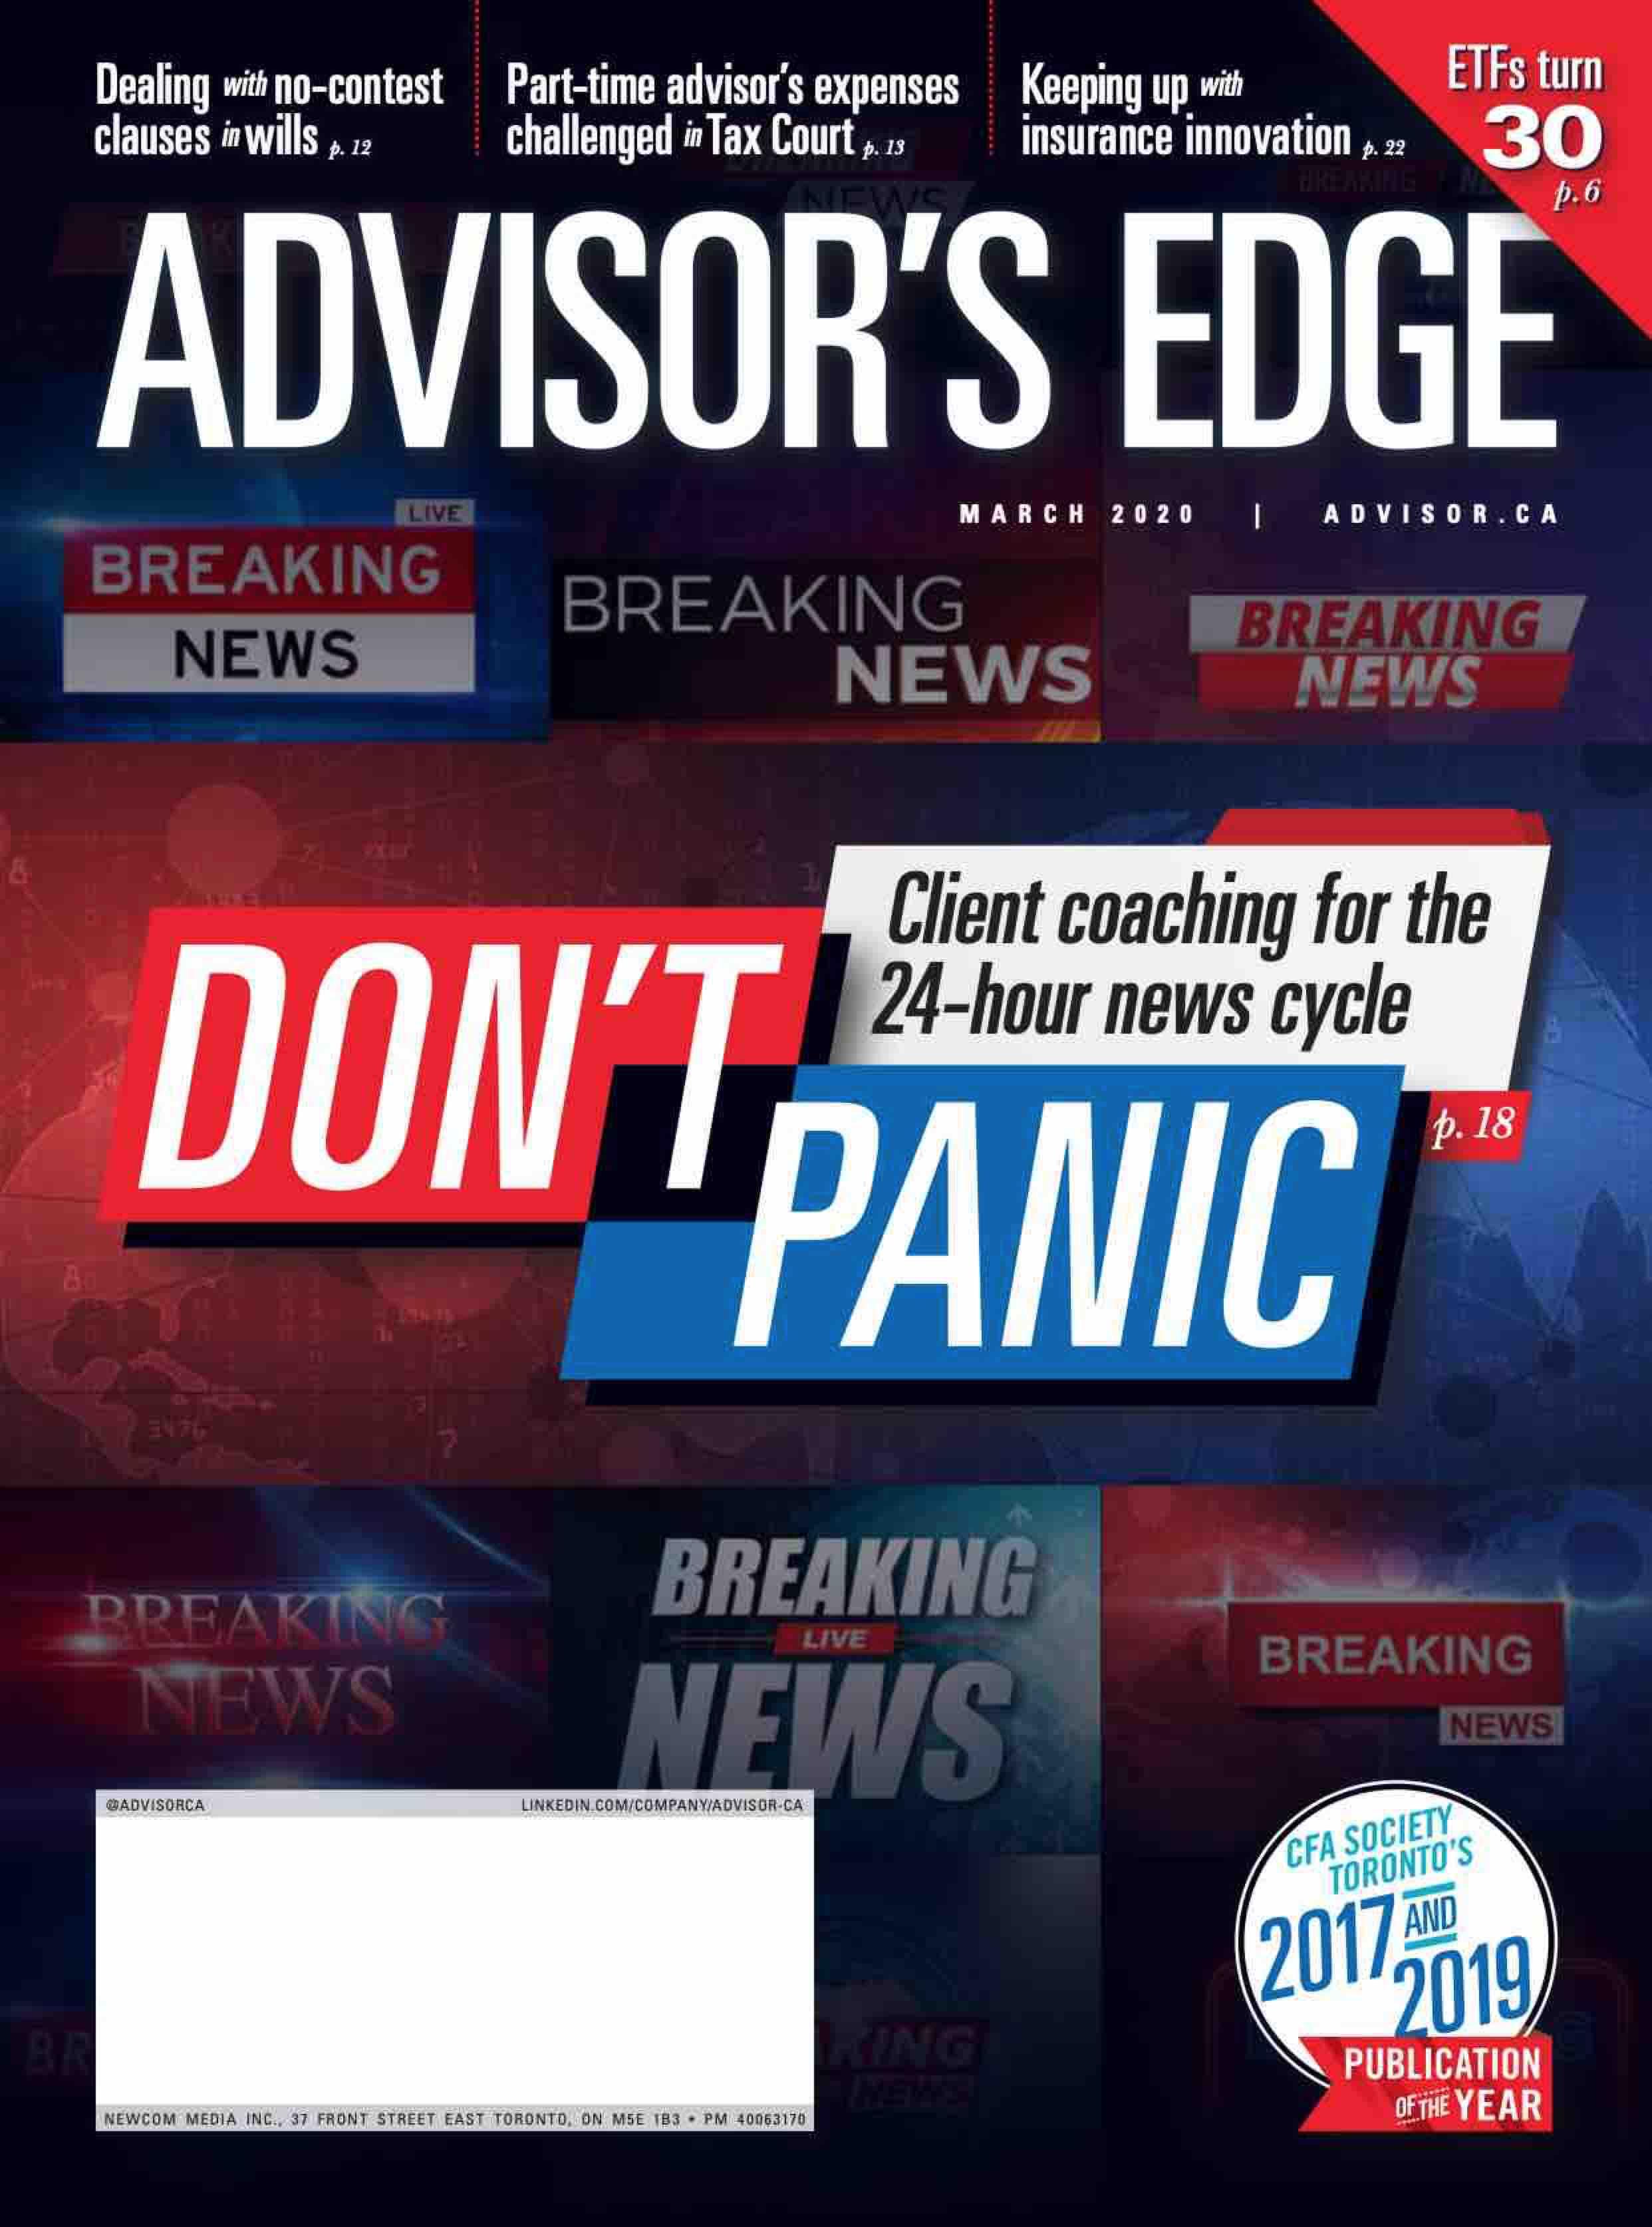 Advisor's Edge – 1 mars 2020